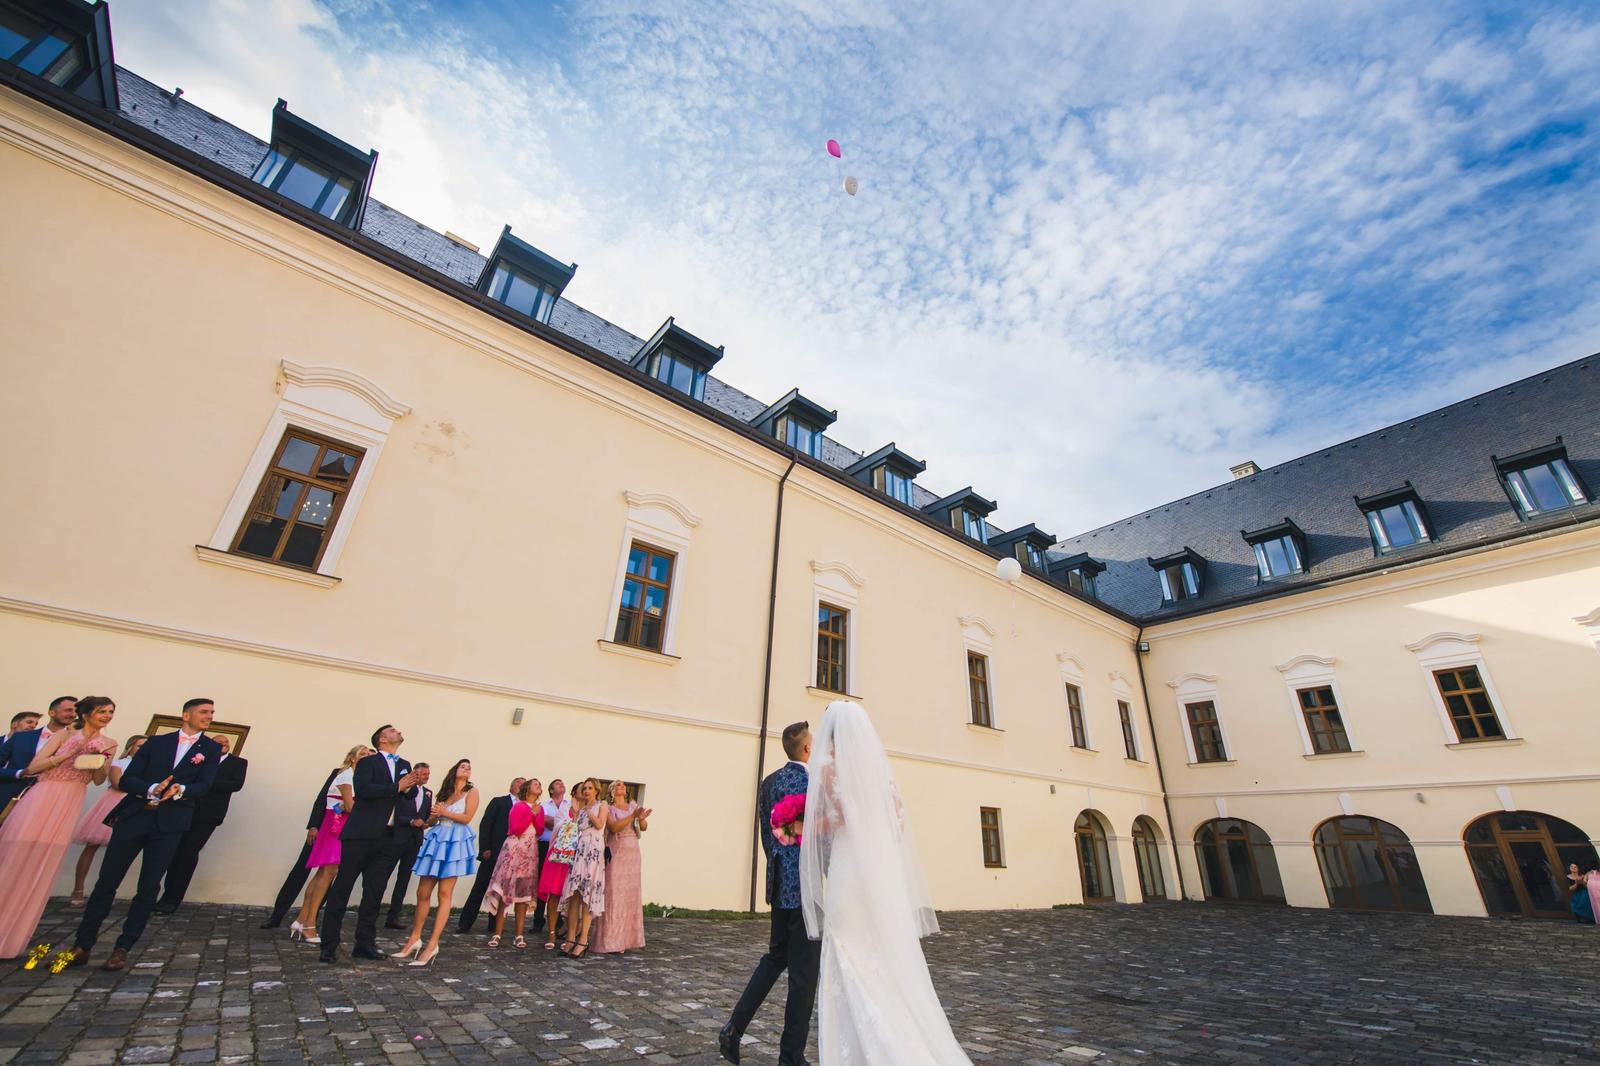 SVADBY 2019 - Fotograf: Foto Antal